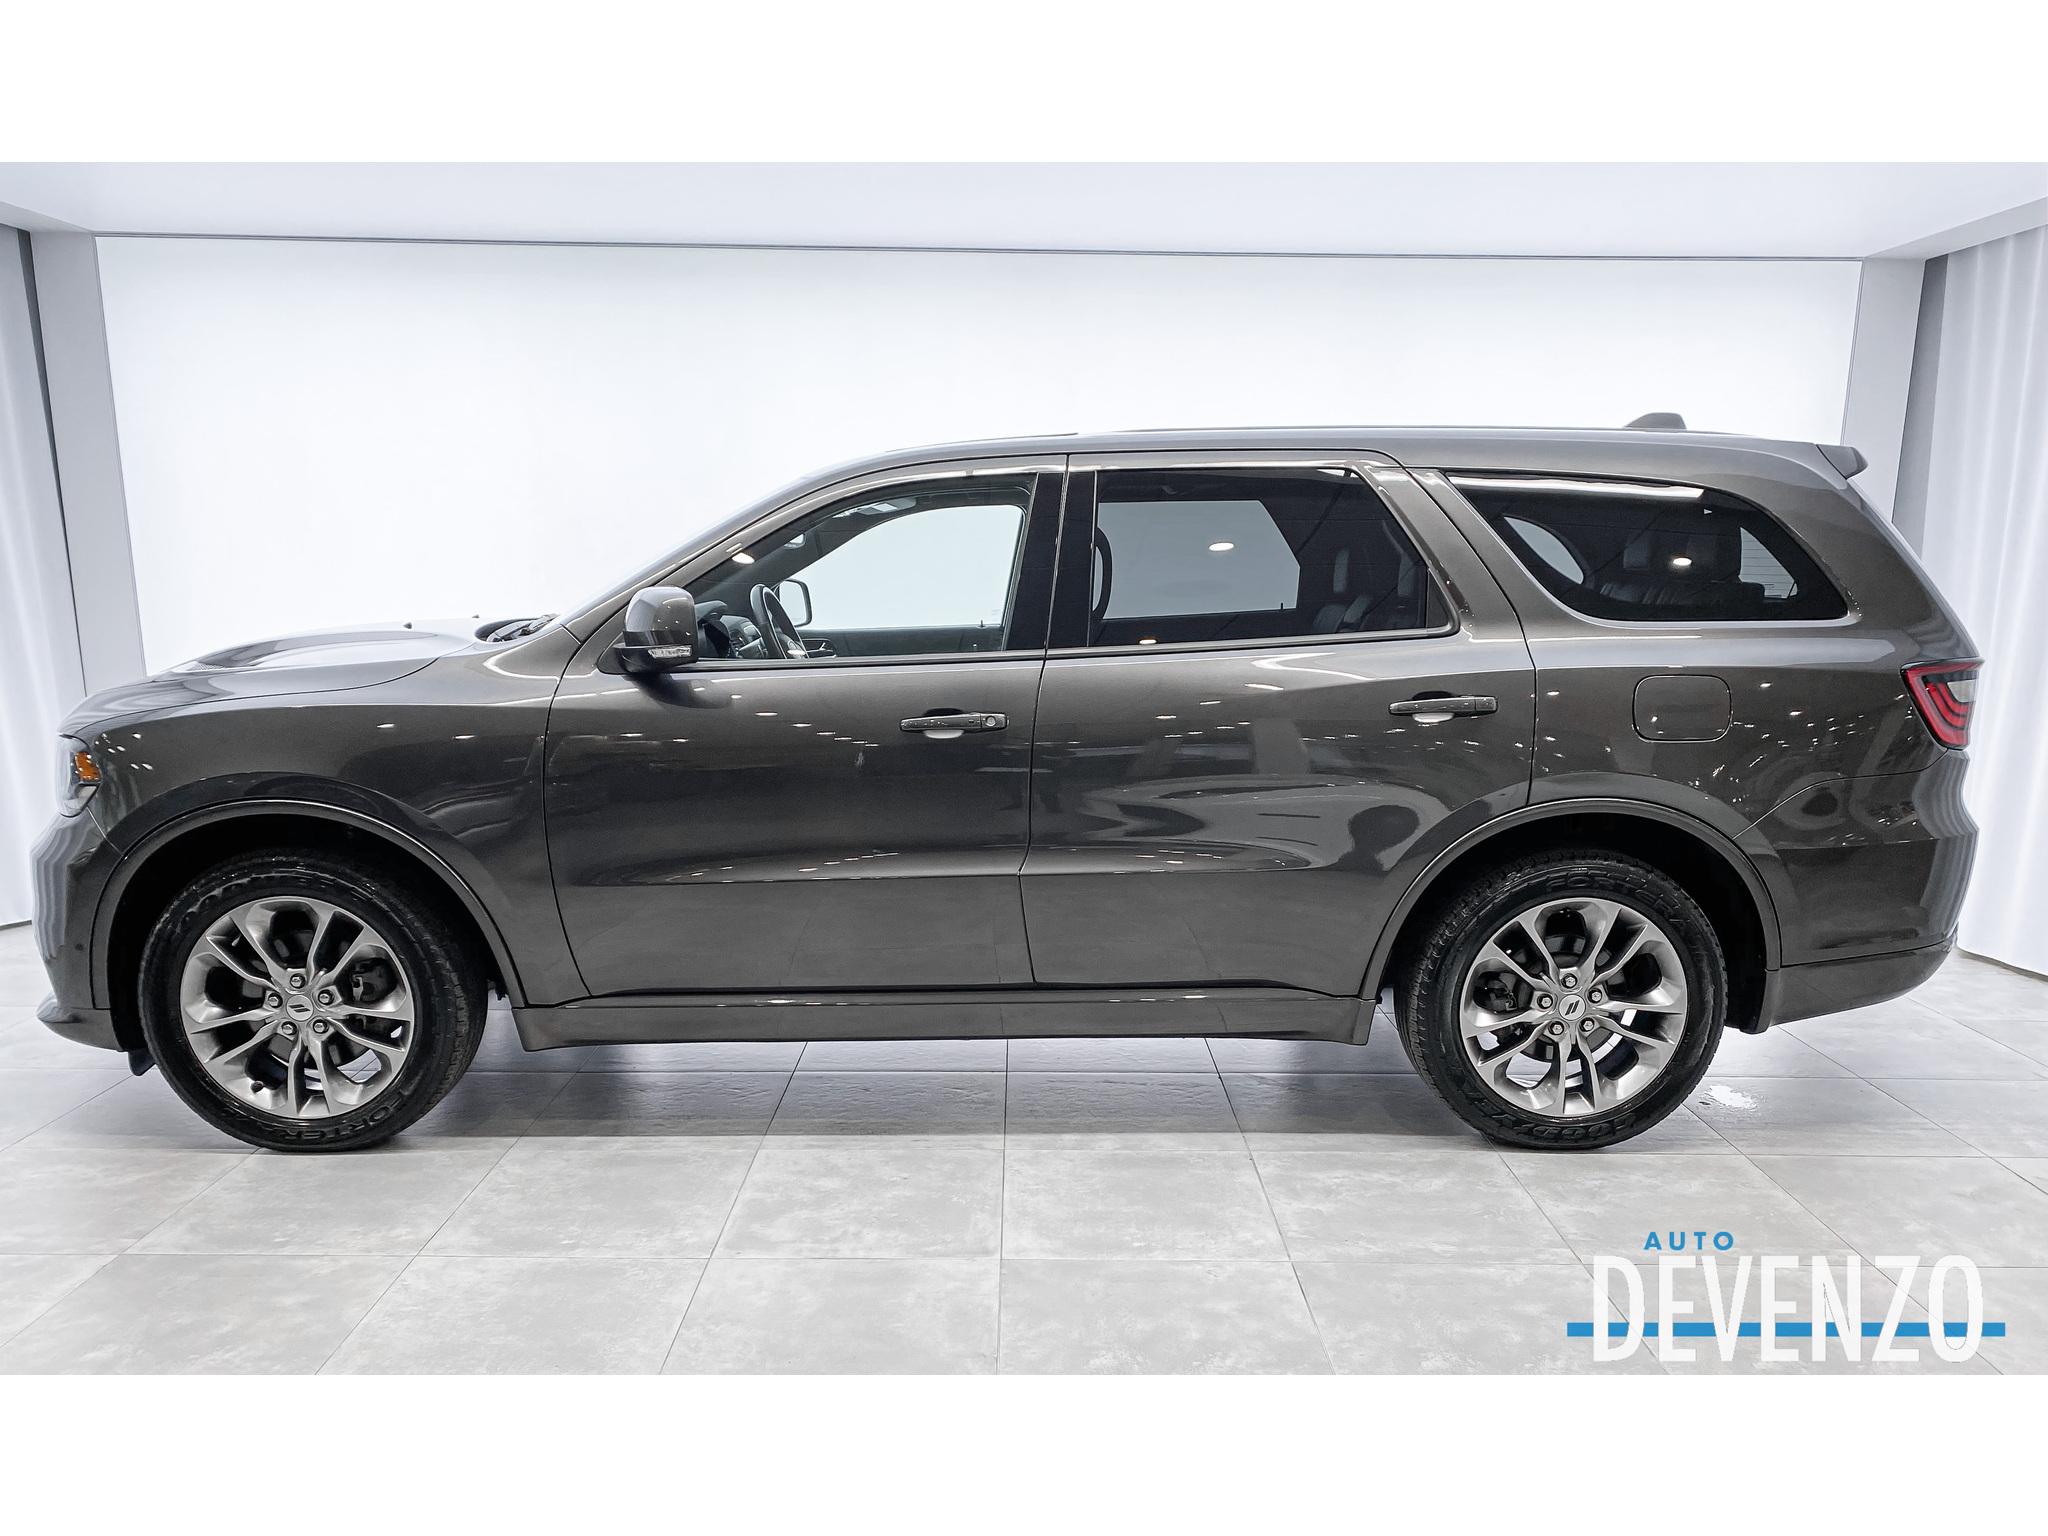 2019 Dodge Durango R/T AWD 5.7L HEMI NAVI / CAMERA 7 PASS complet